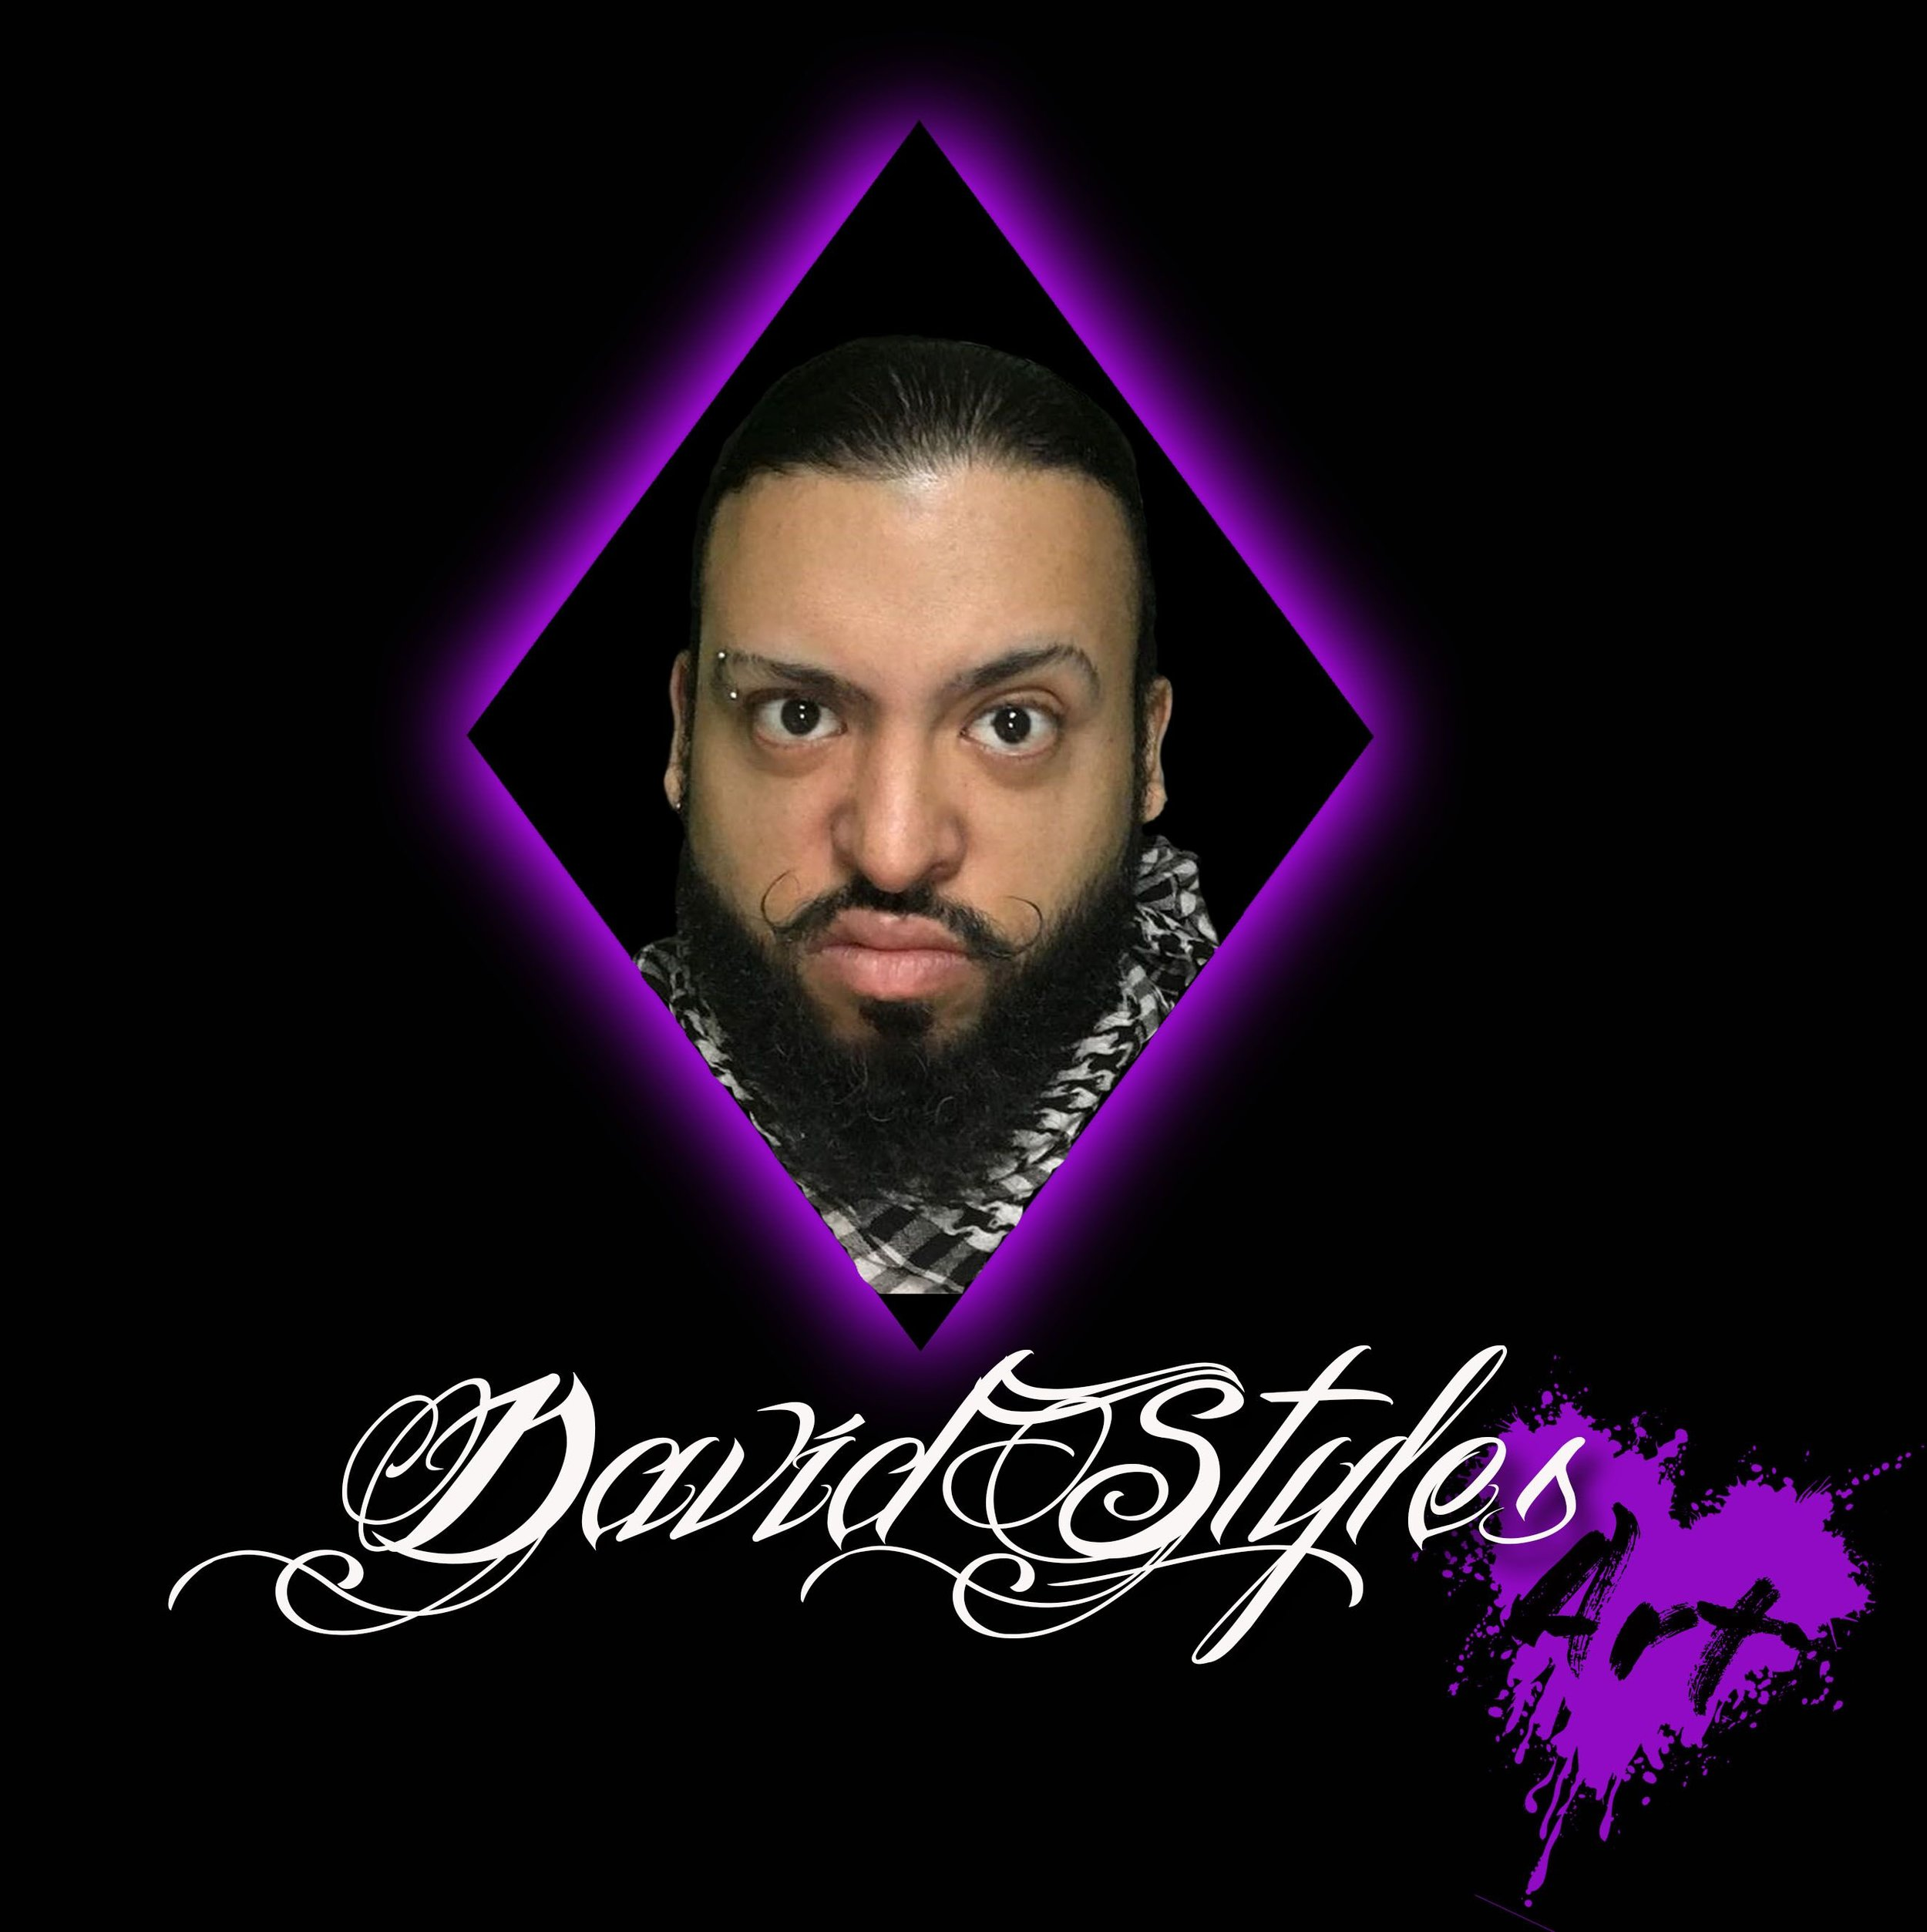 David Styles